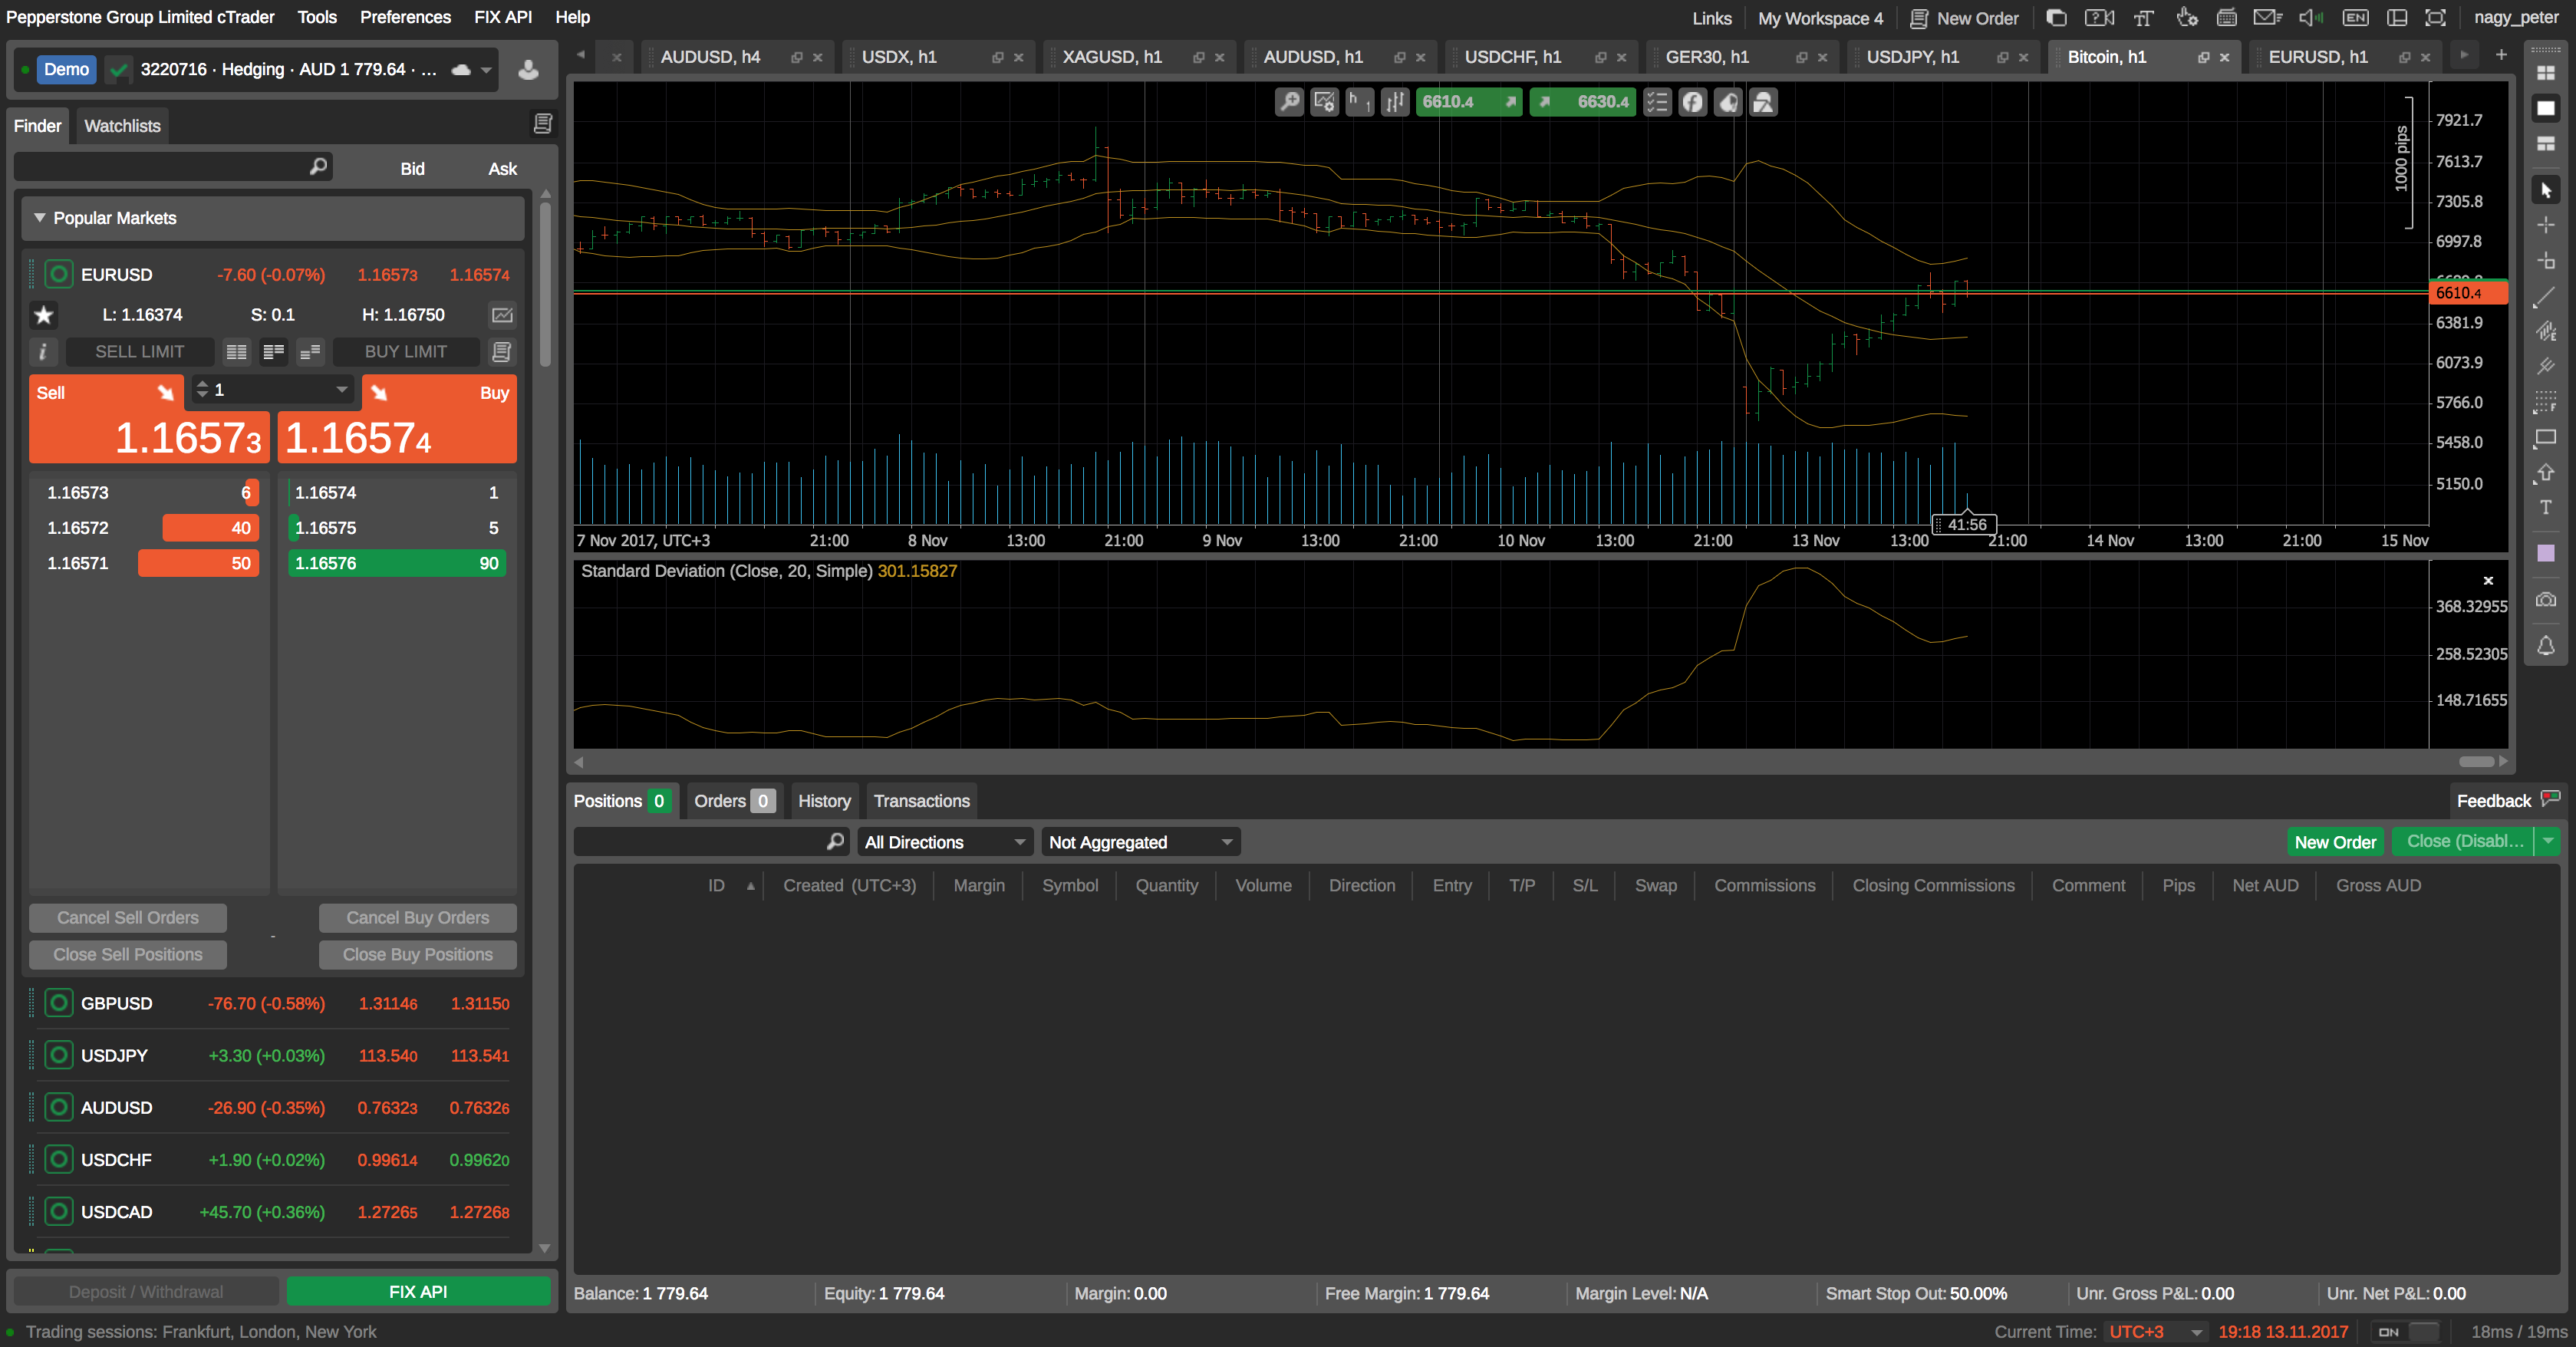 ESMA-CFD-intervention-new-regulation-blogpost-Pepperstone-web-trading-platform